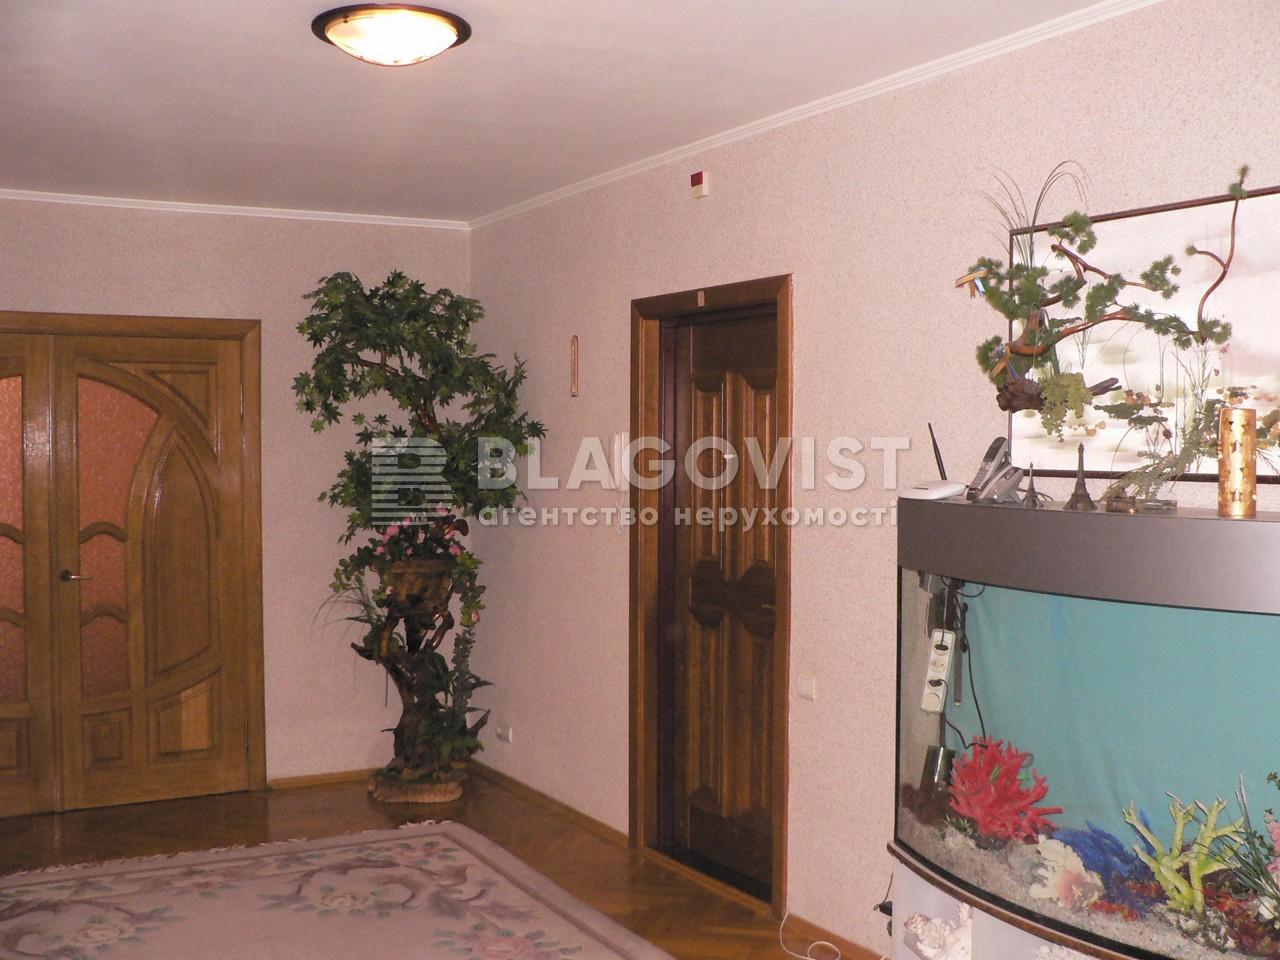 Квартира C-102568, Урловская, 5, Киев - Фото 11